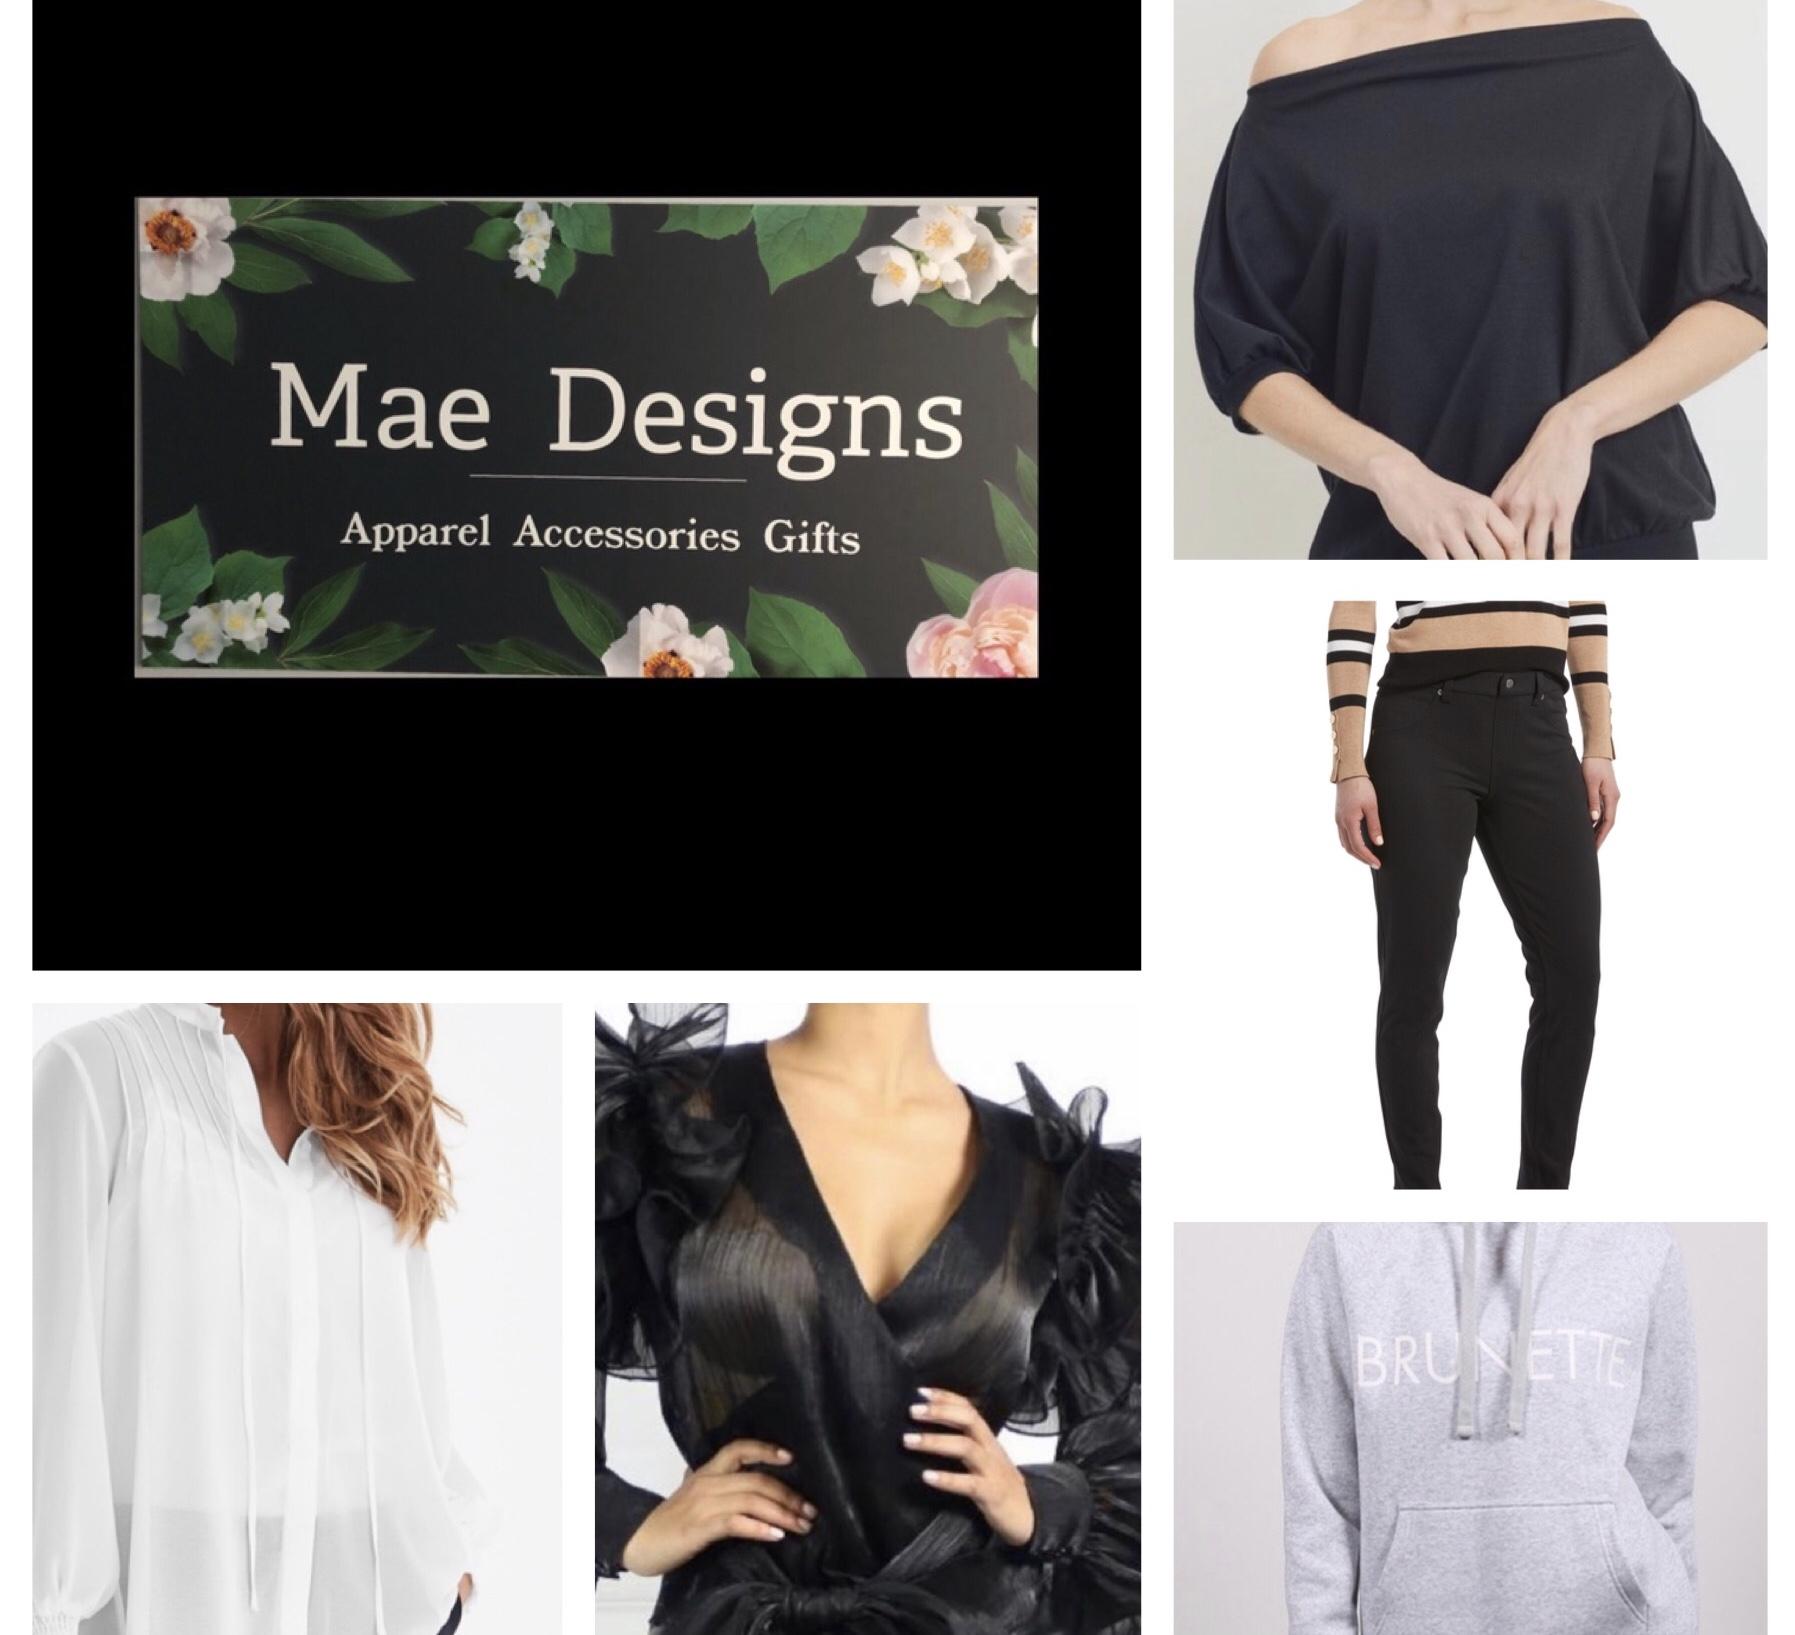 Mae Designs